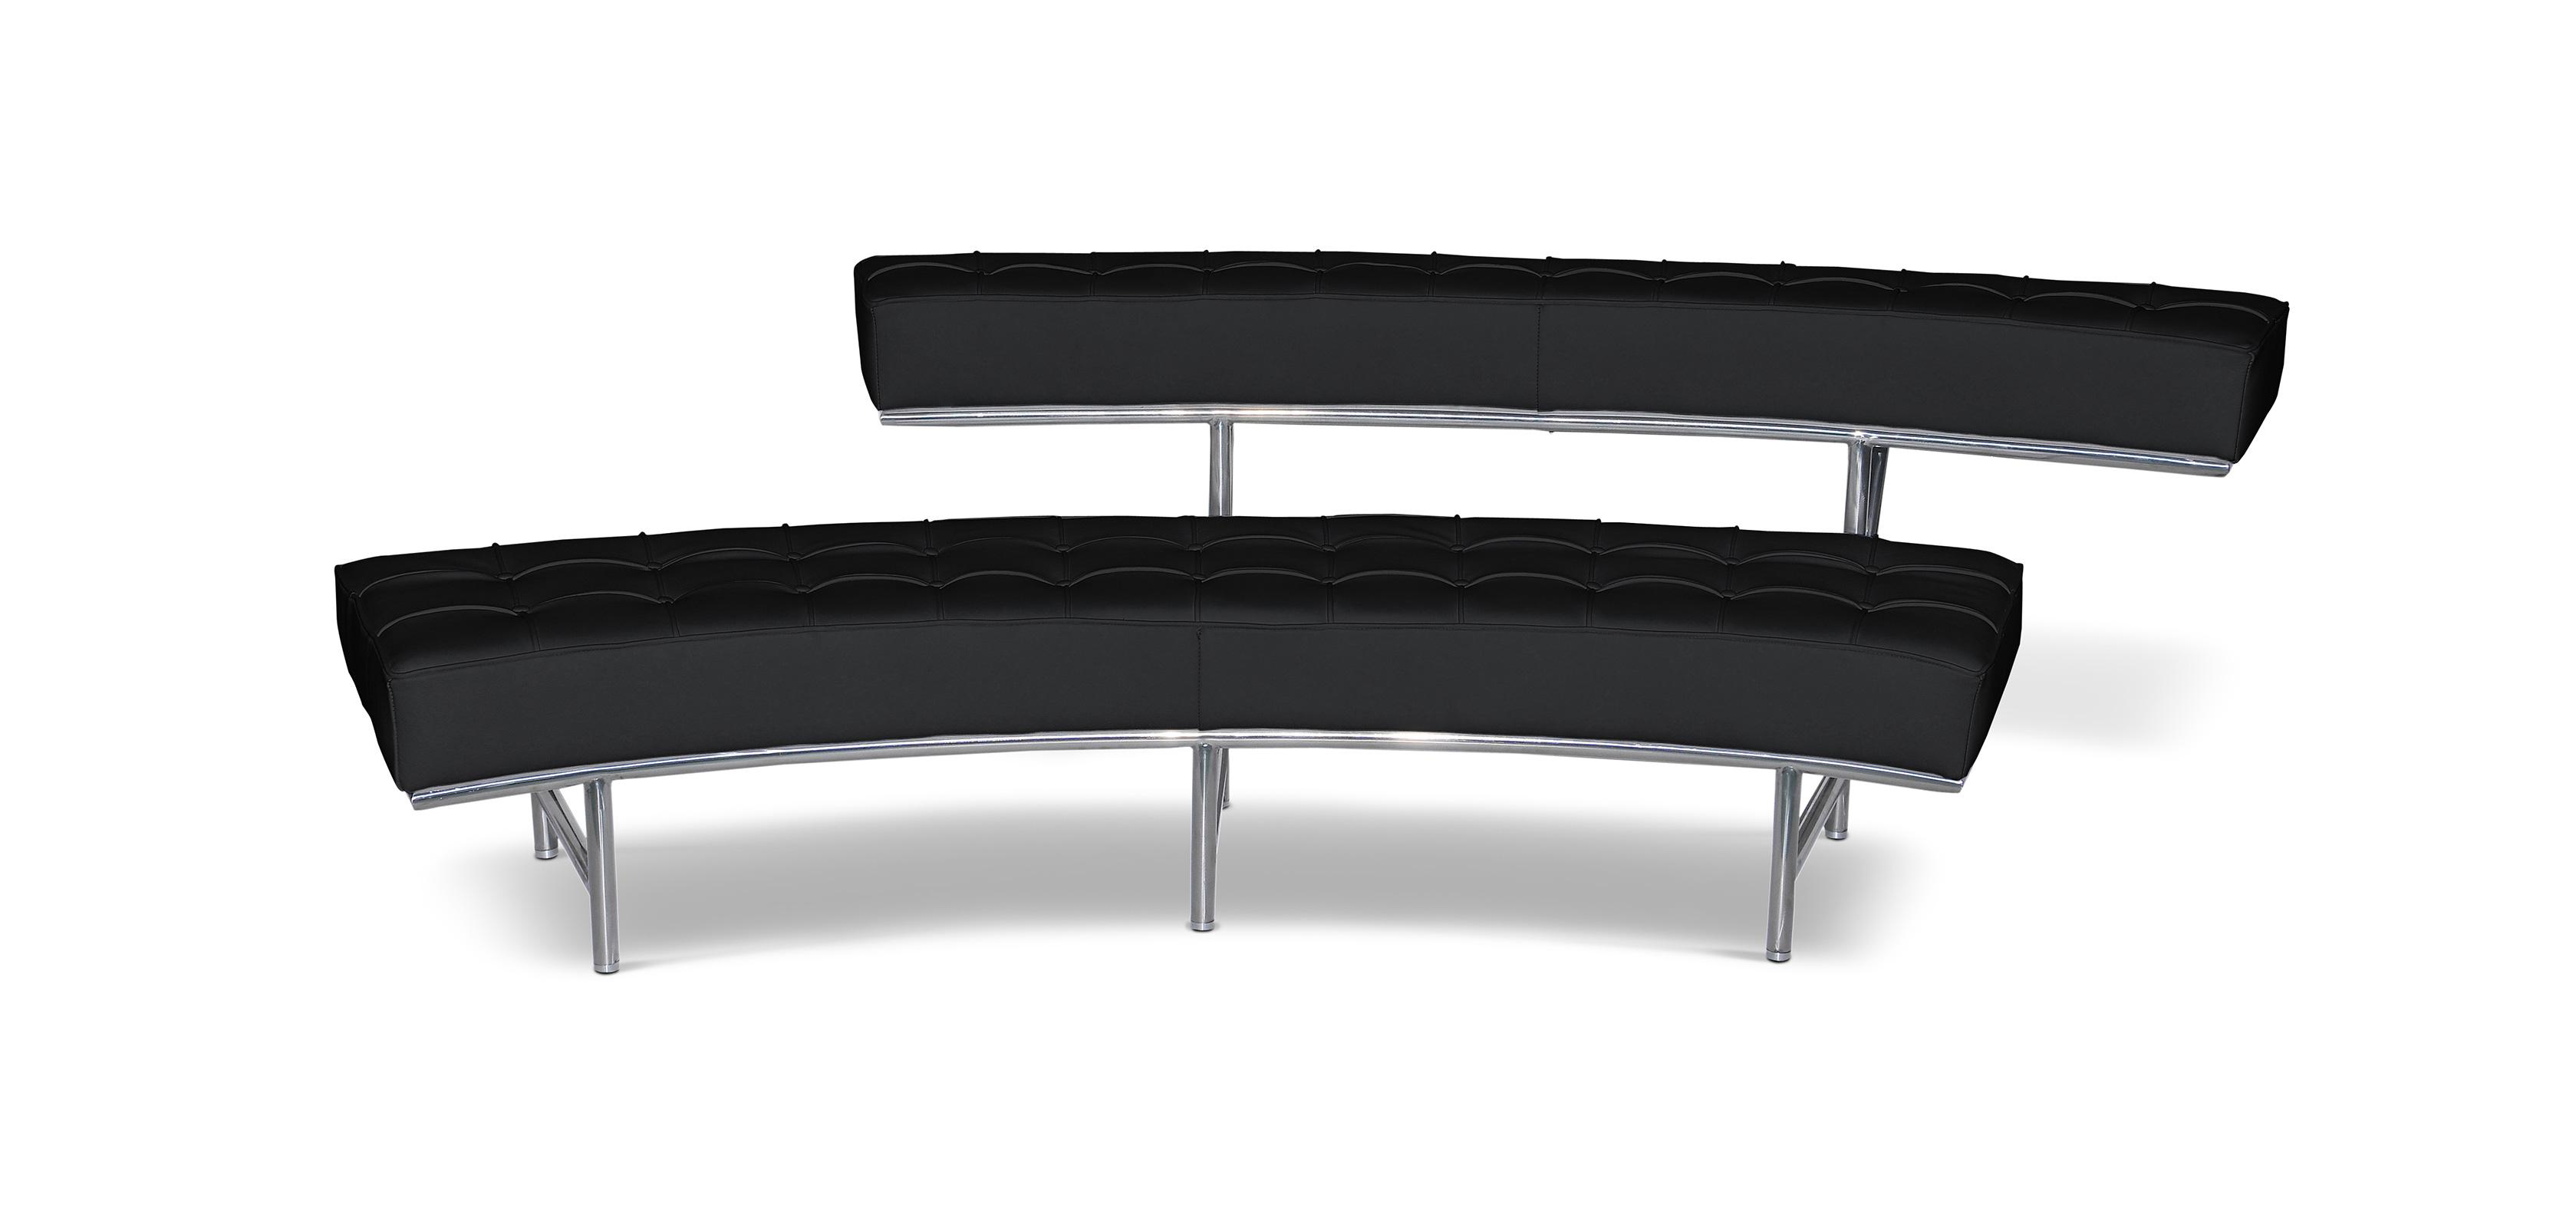 eileen grey furniture. Eileen Grey Furniture F